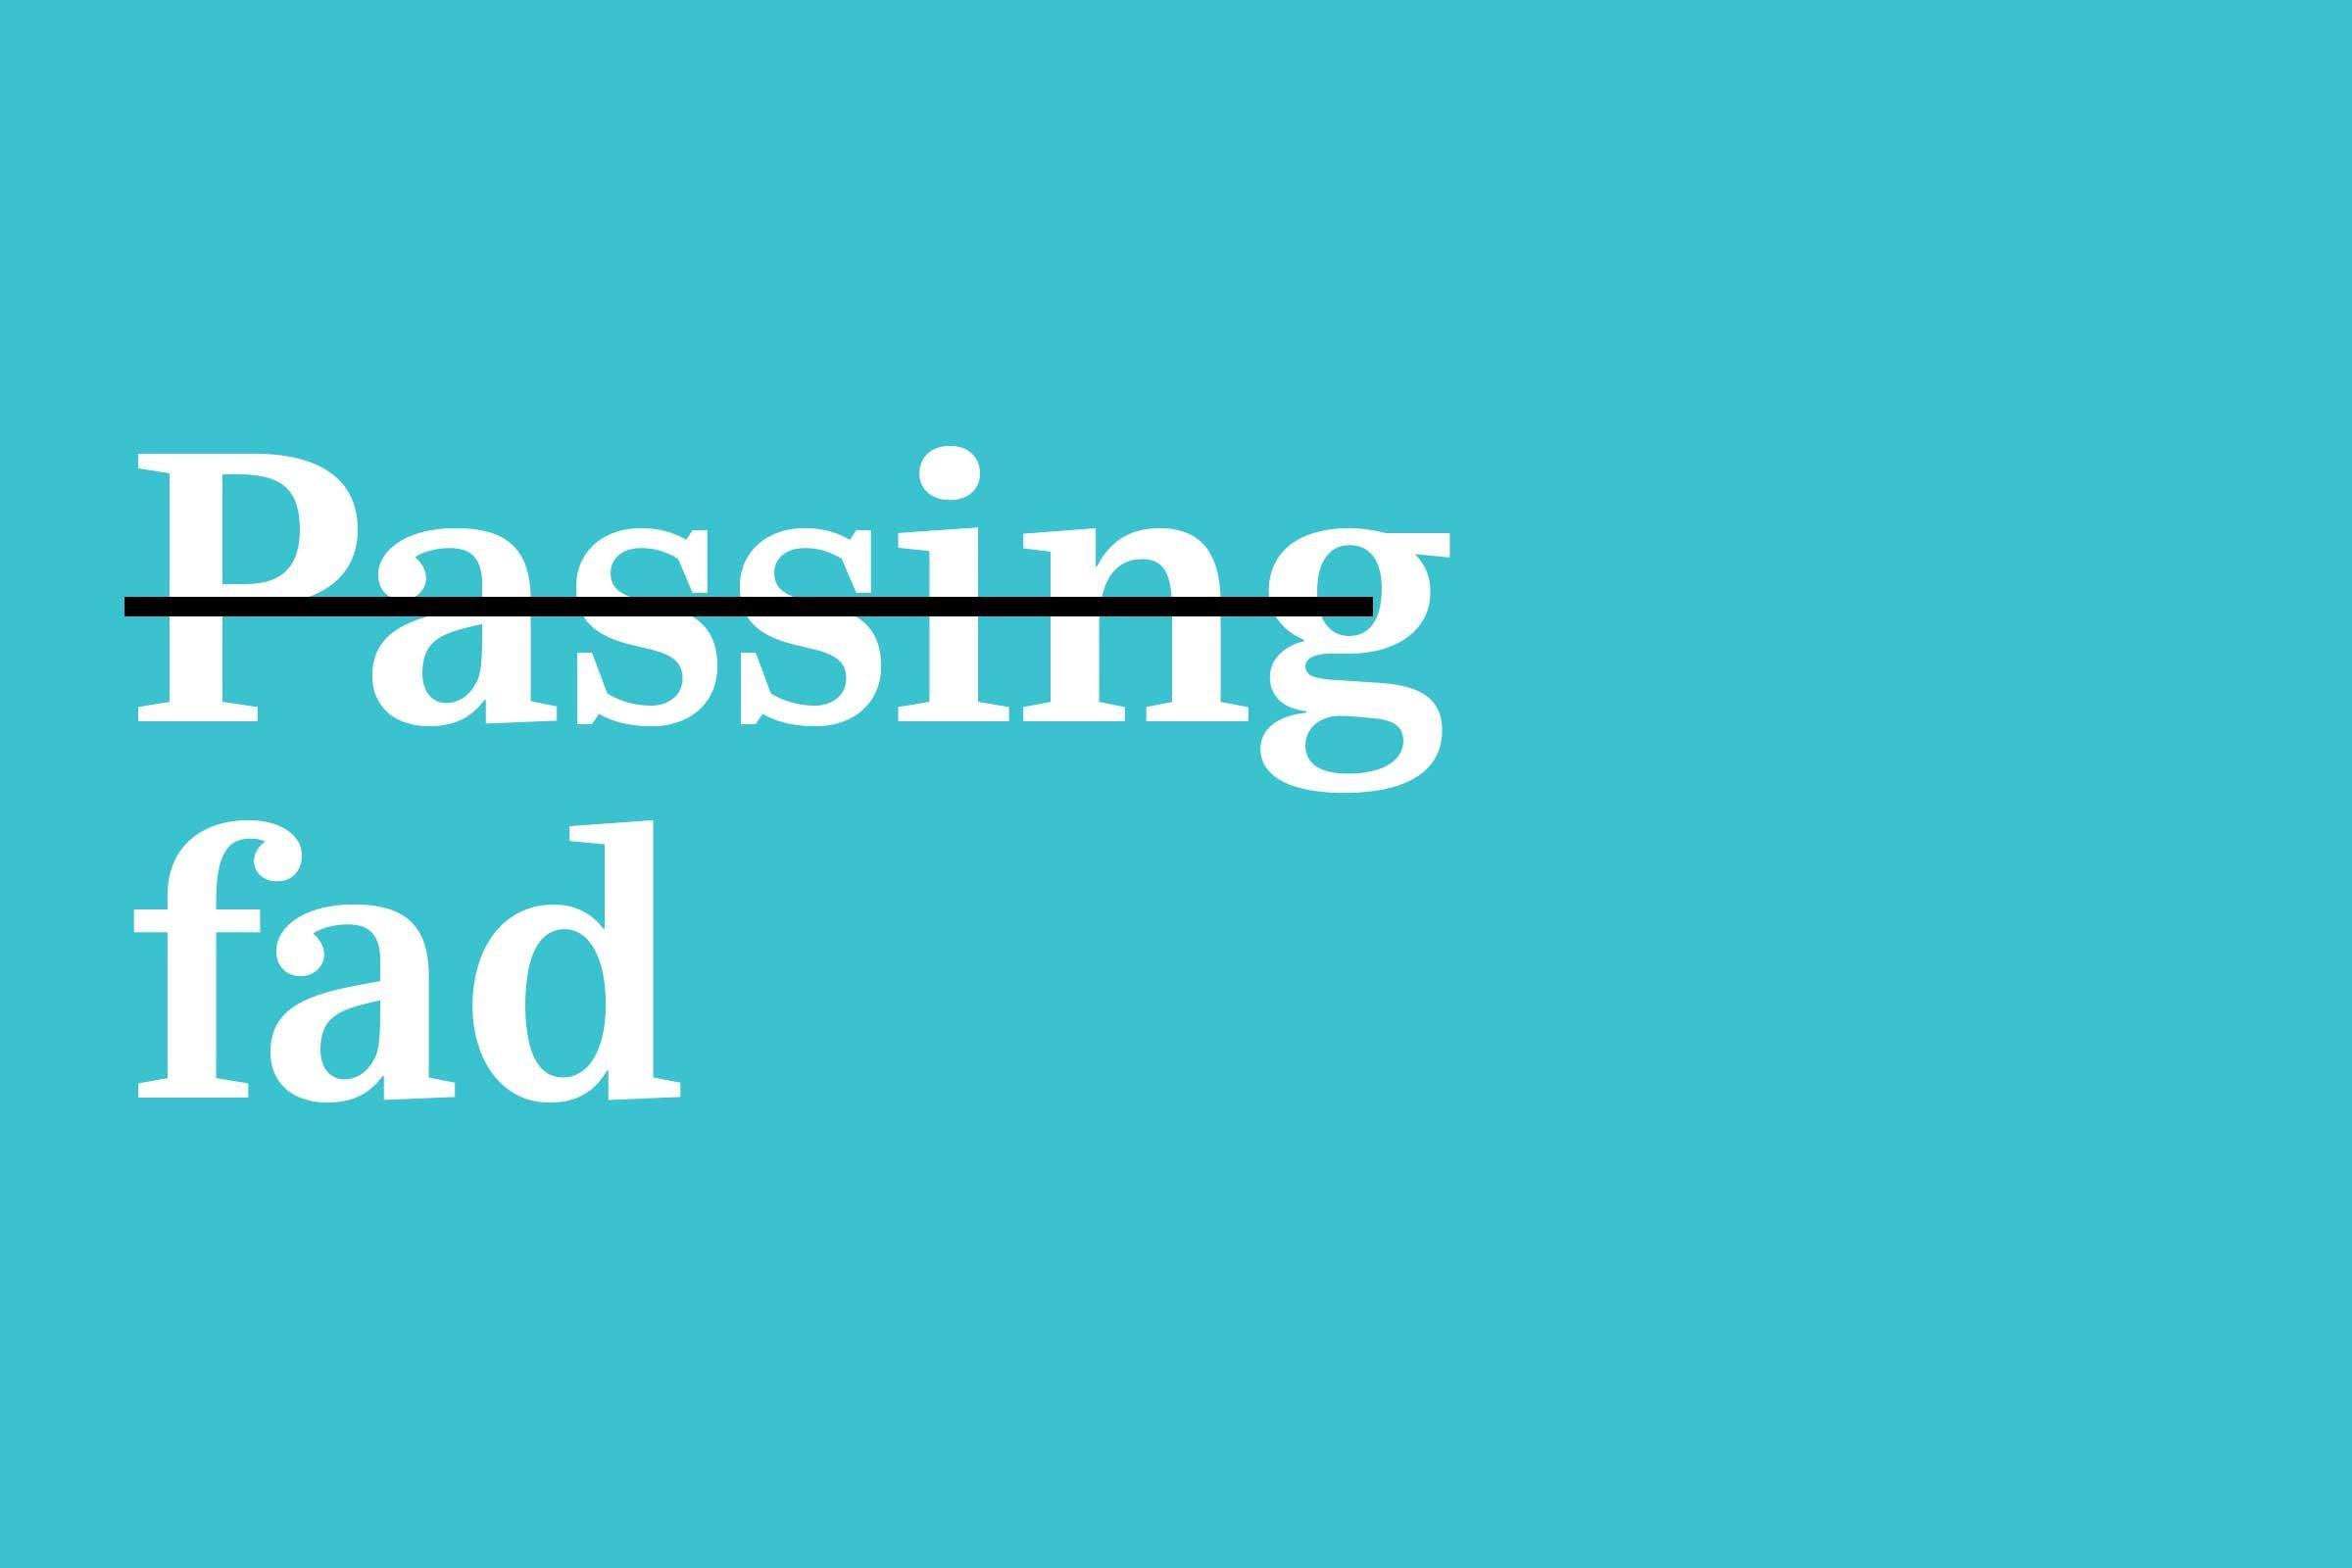 passing fad